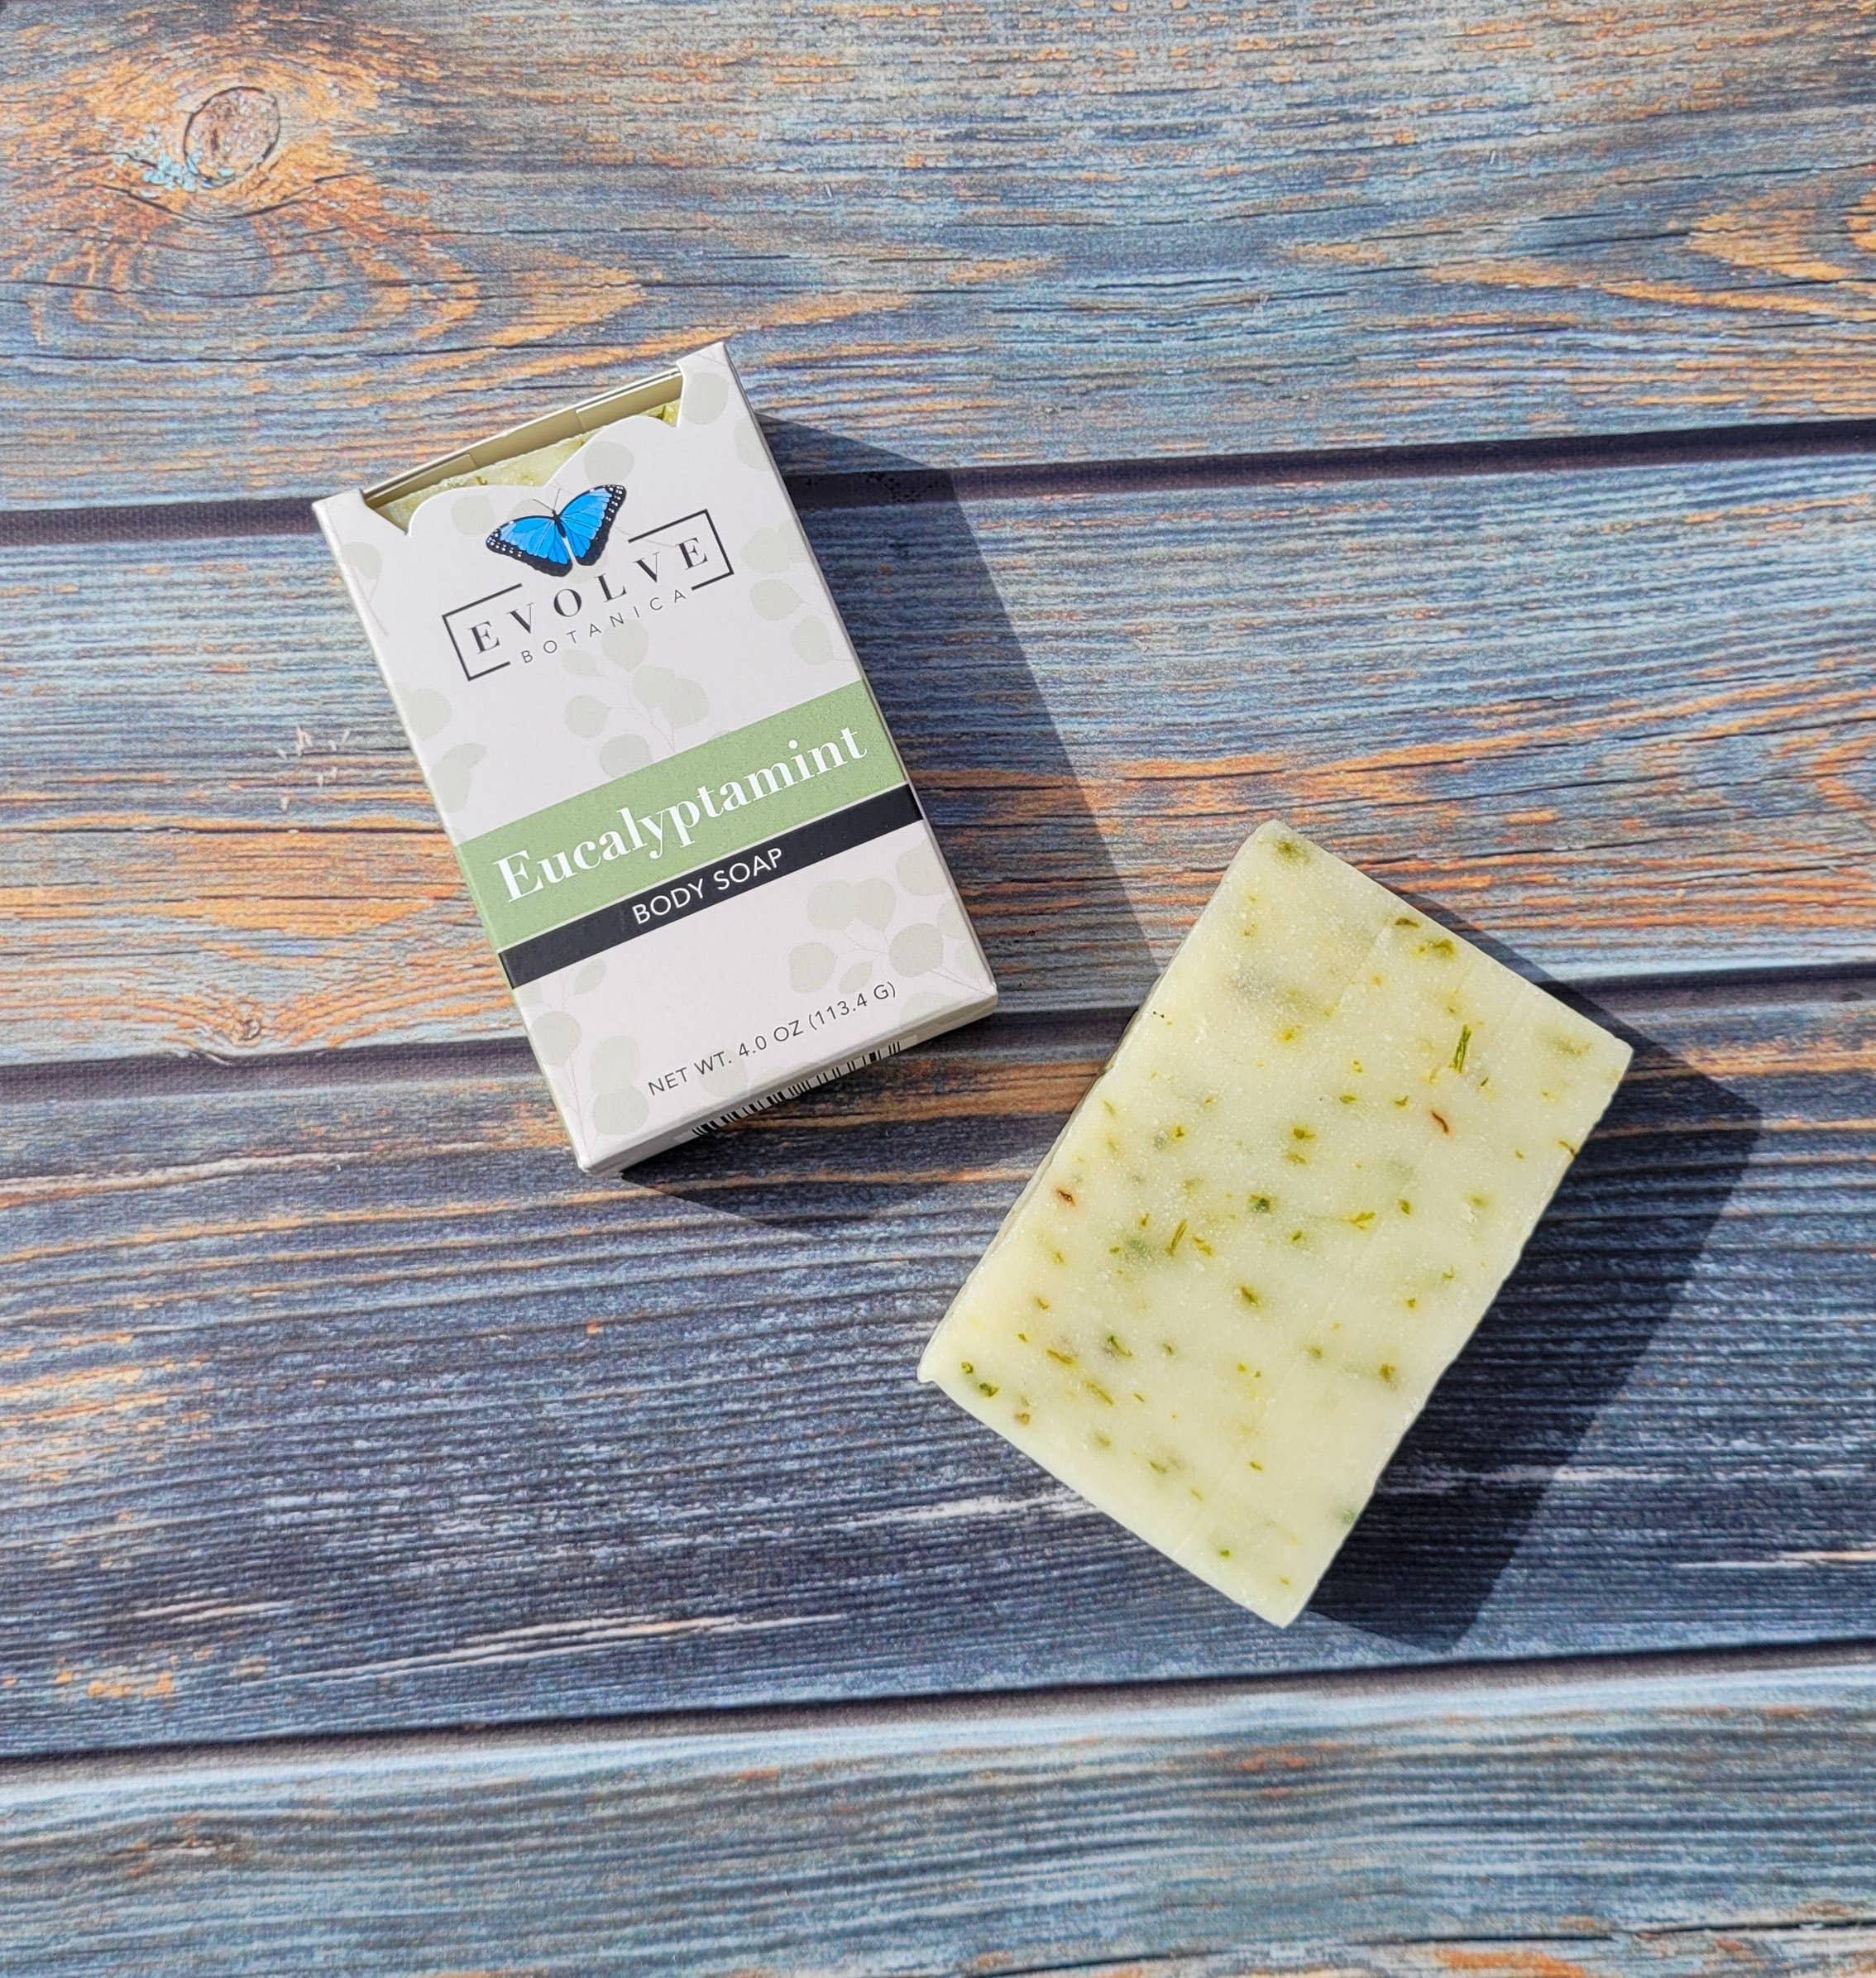 Evolve - Standard Soap - Eucalyptamint   Trada Marketplace